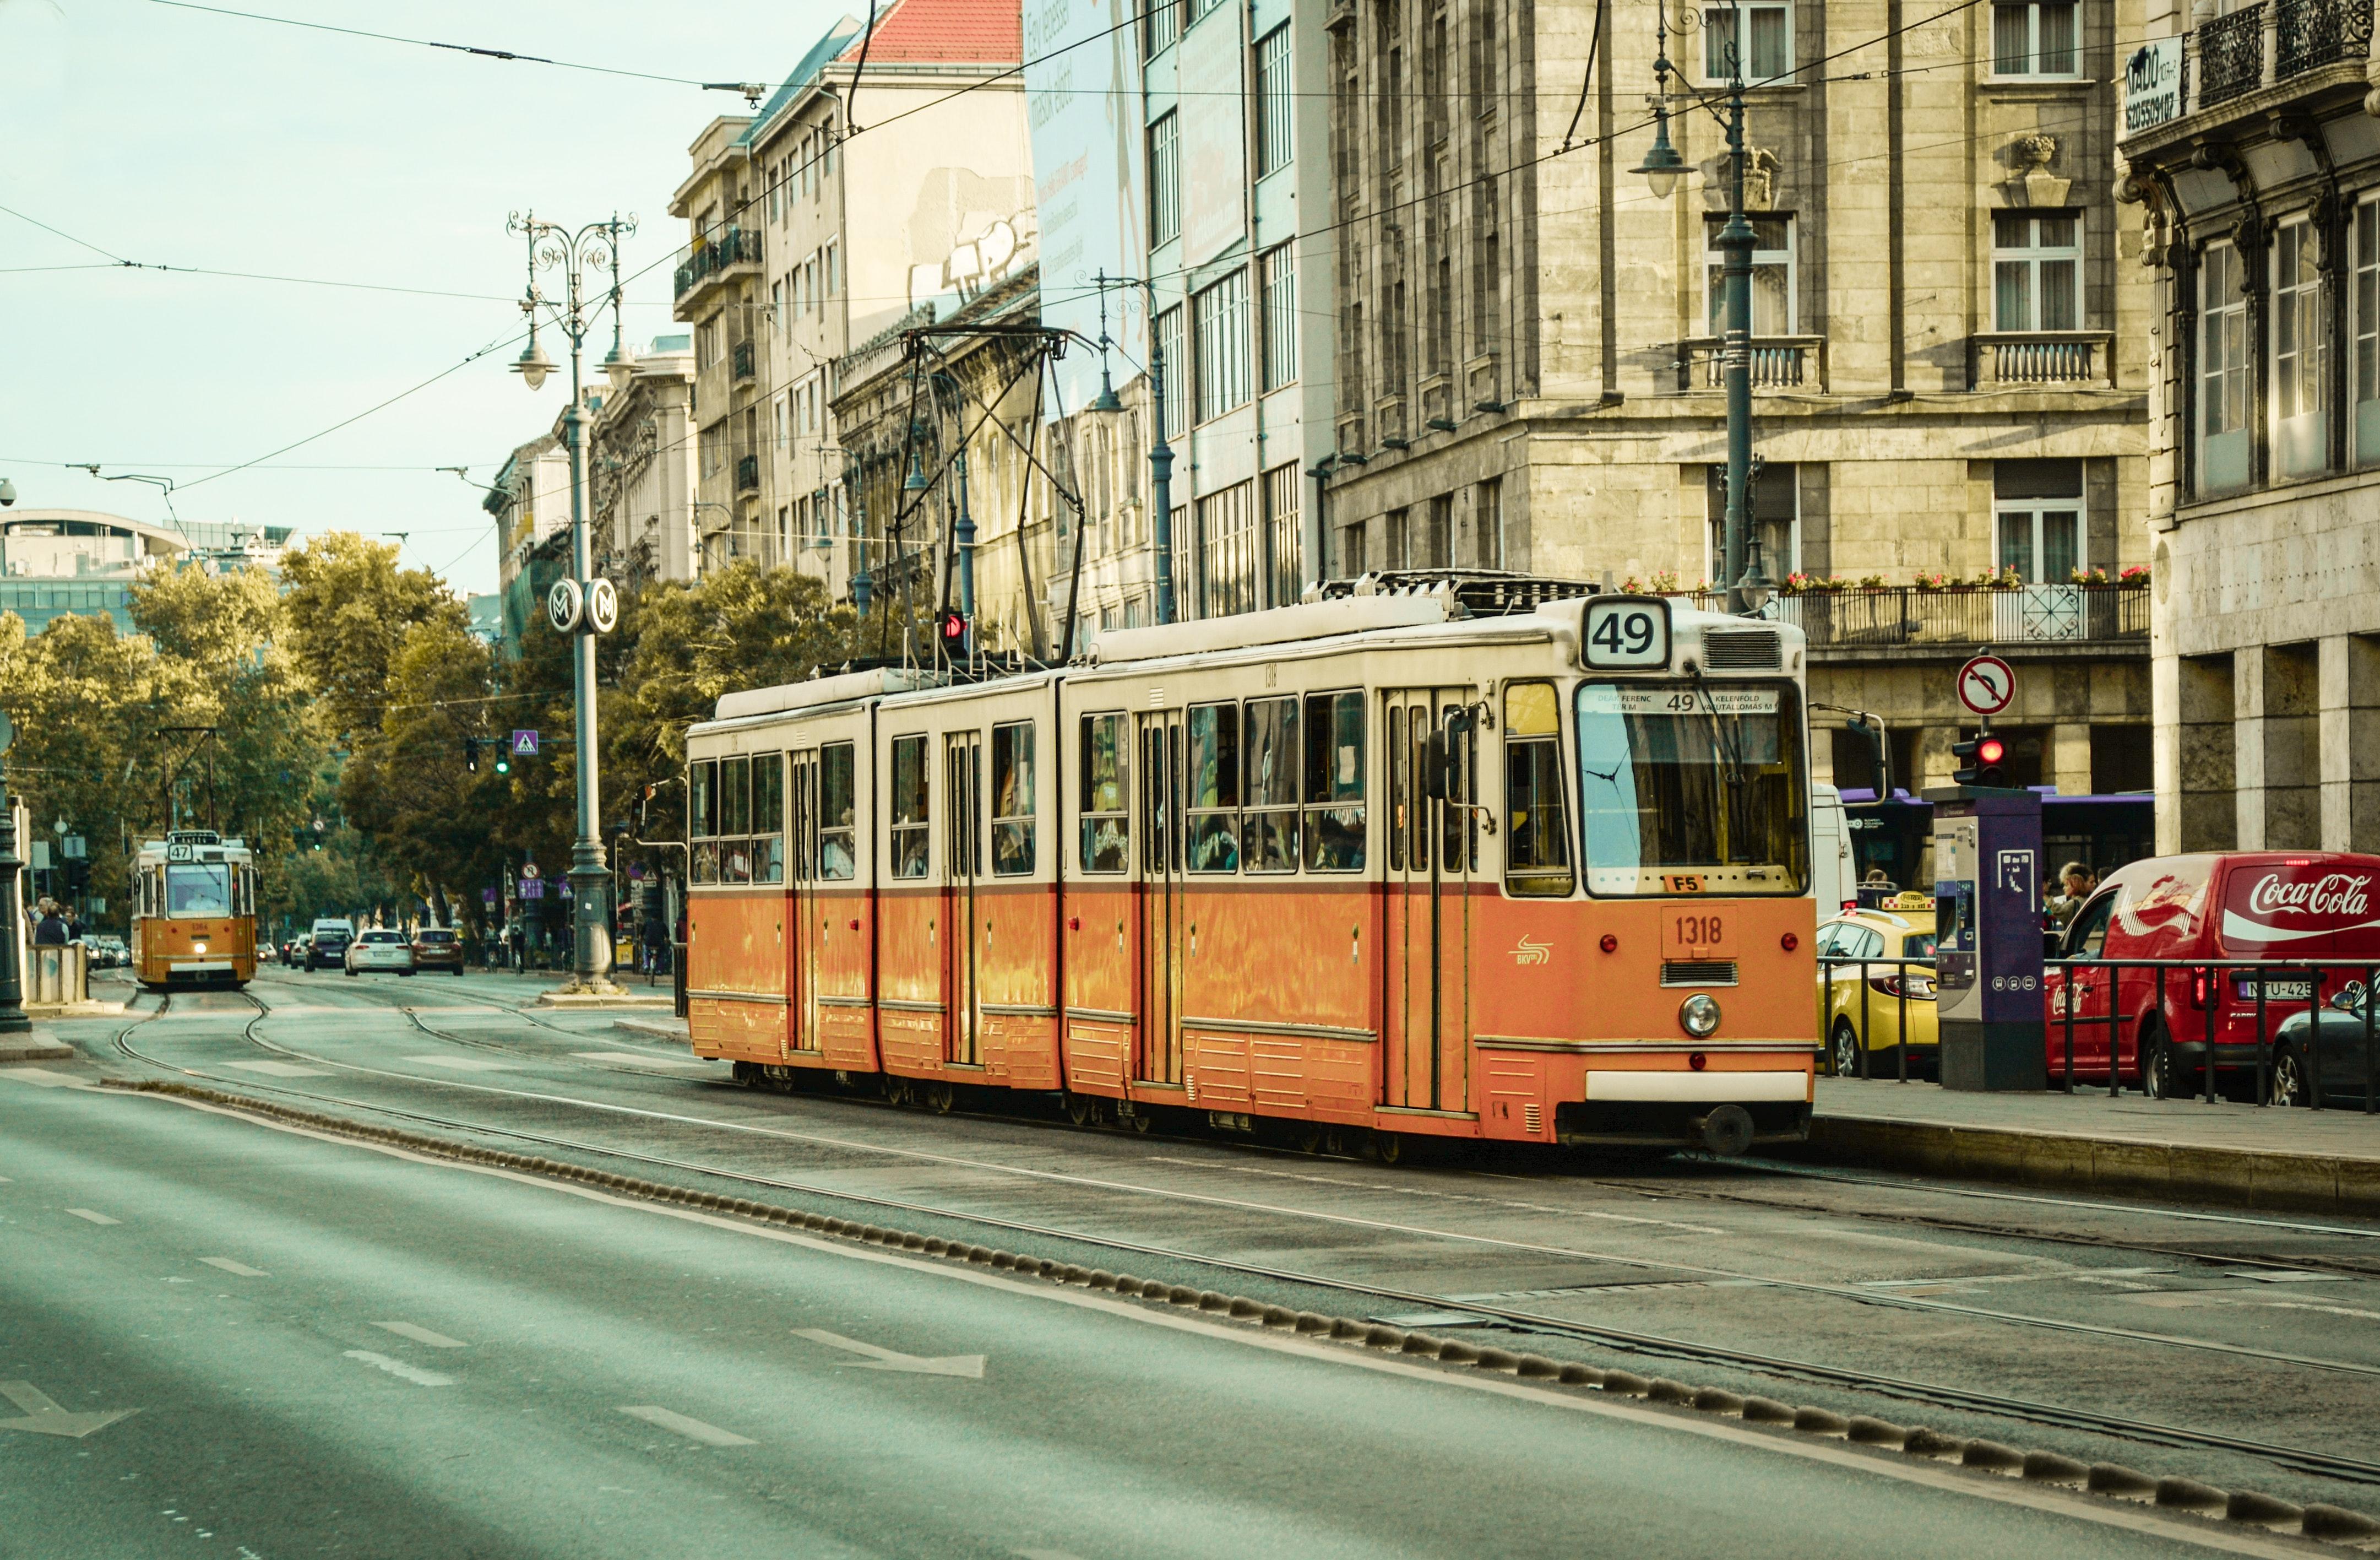 White and orange train near city buildings photo